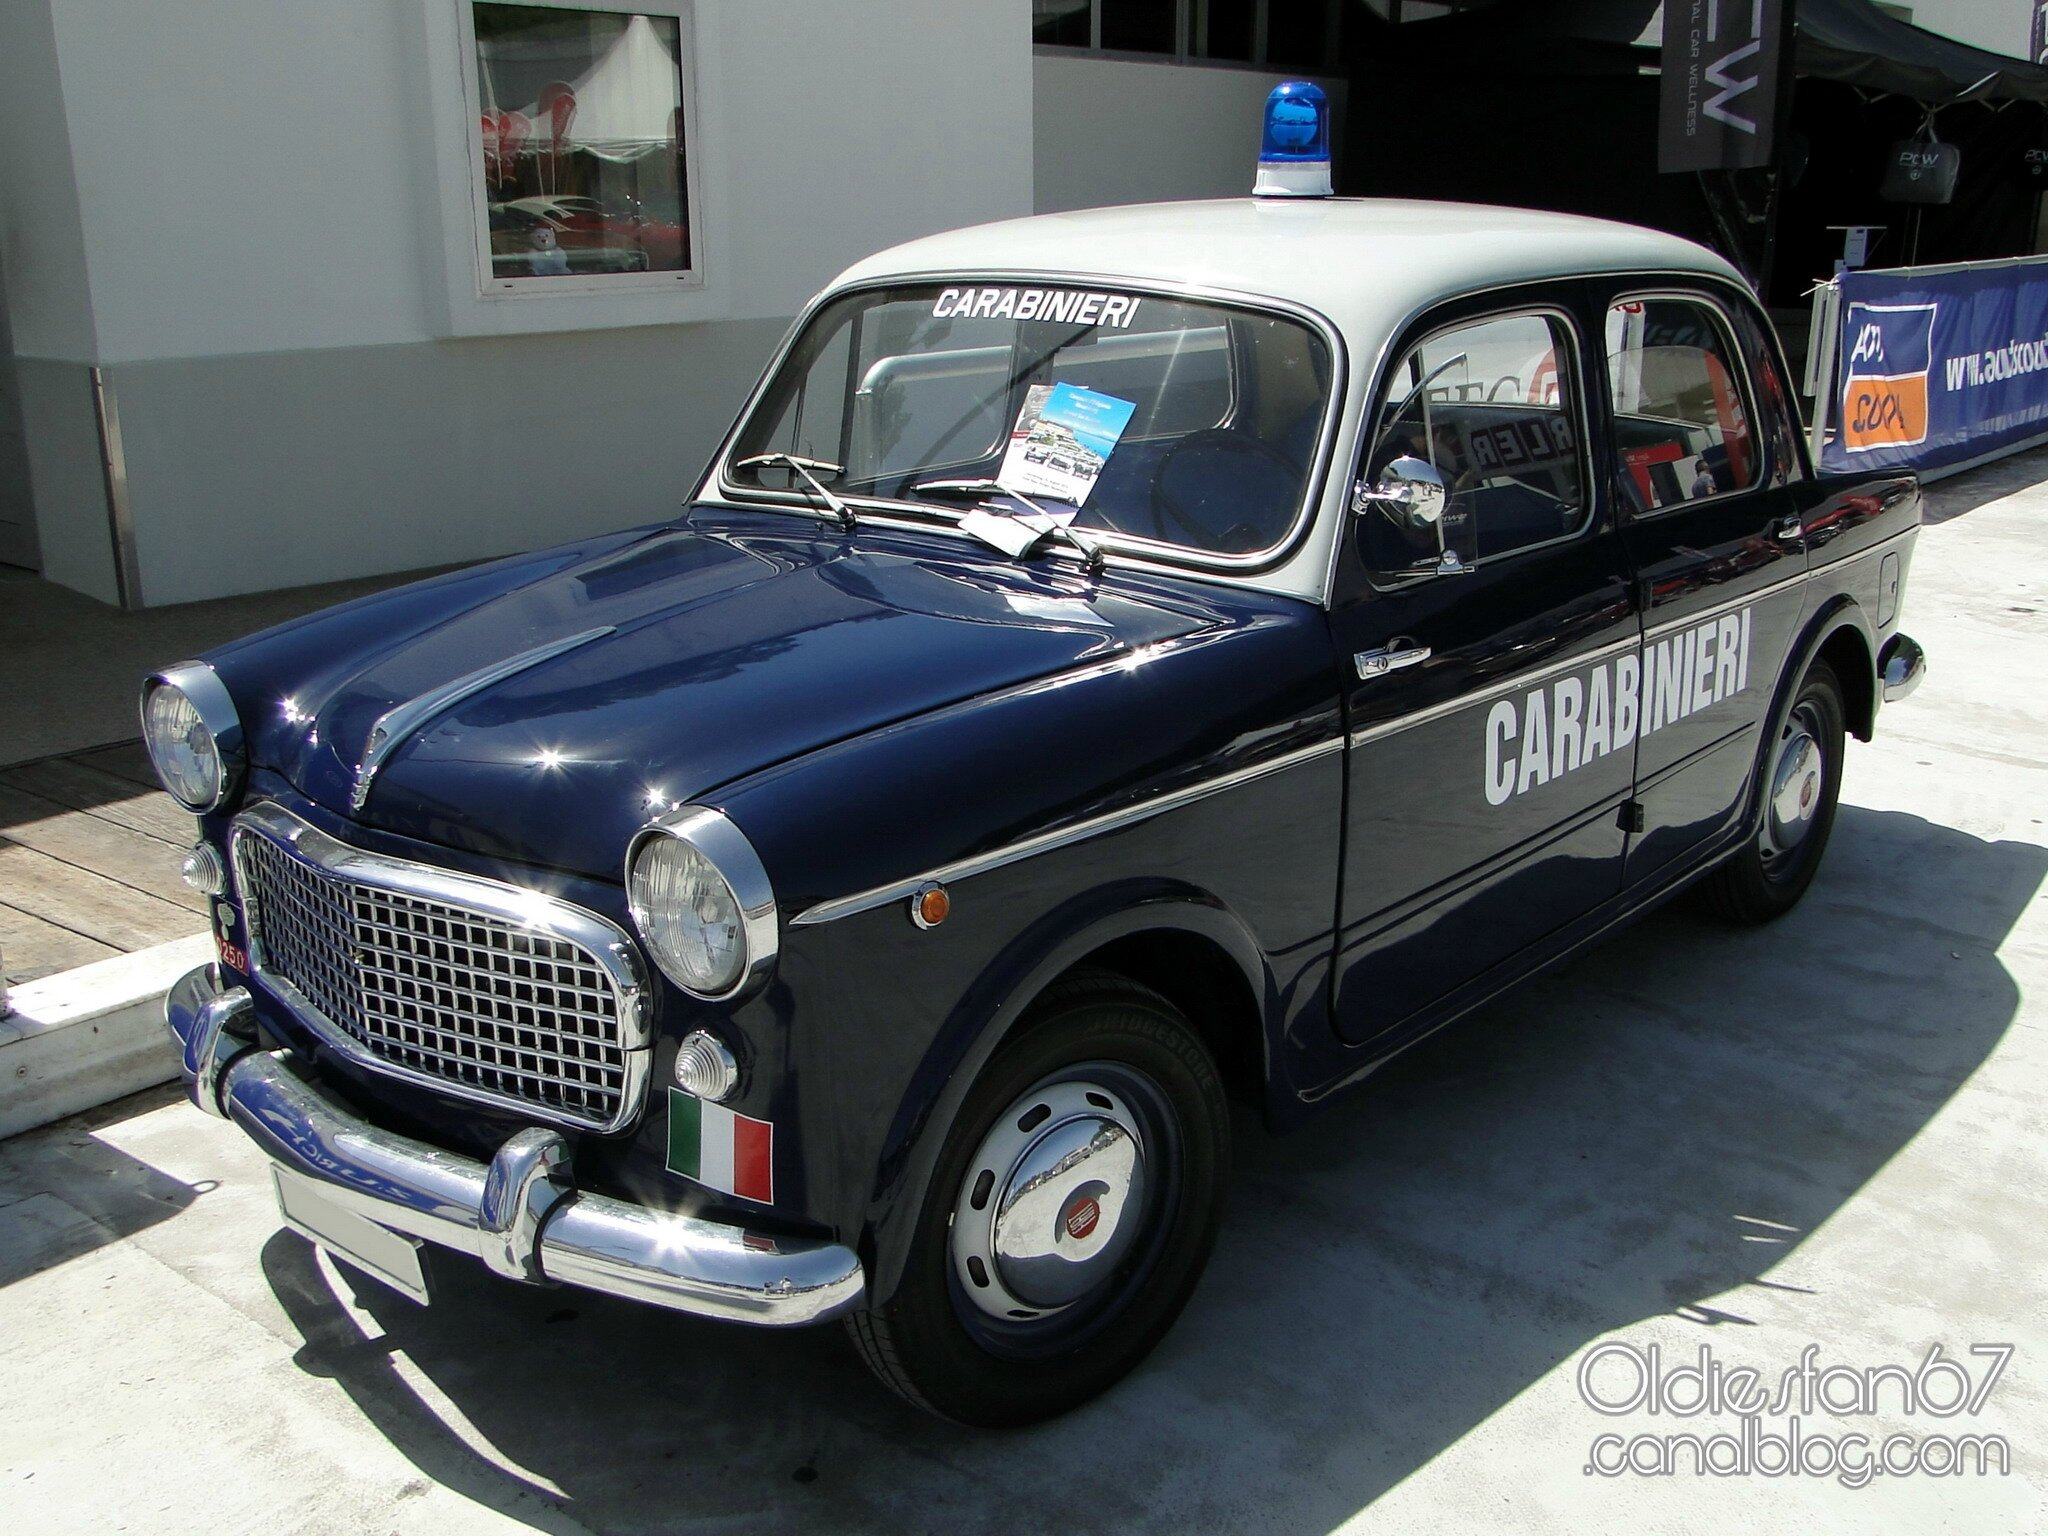 fiat-1100-103-carabinieri-1958-1961-01